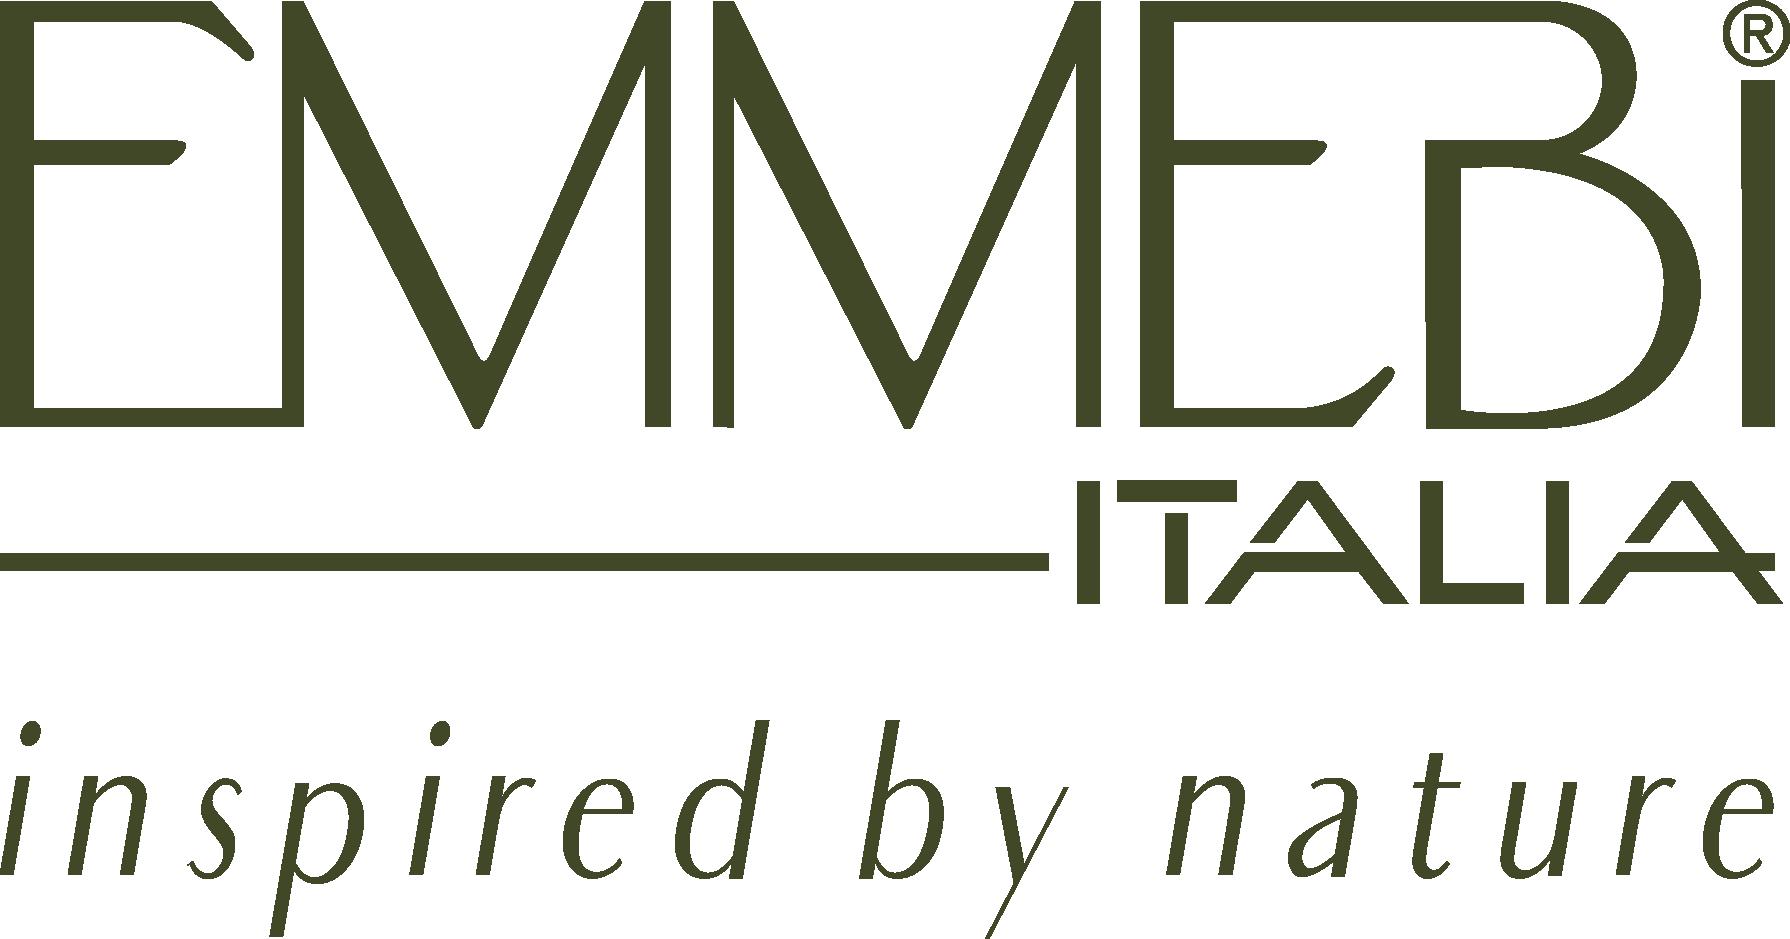 Emmebi Gate Man